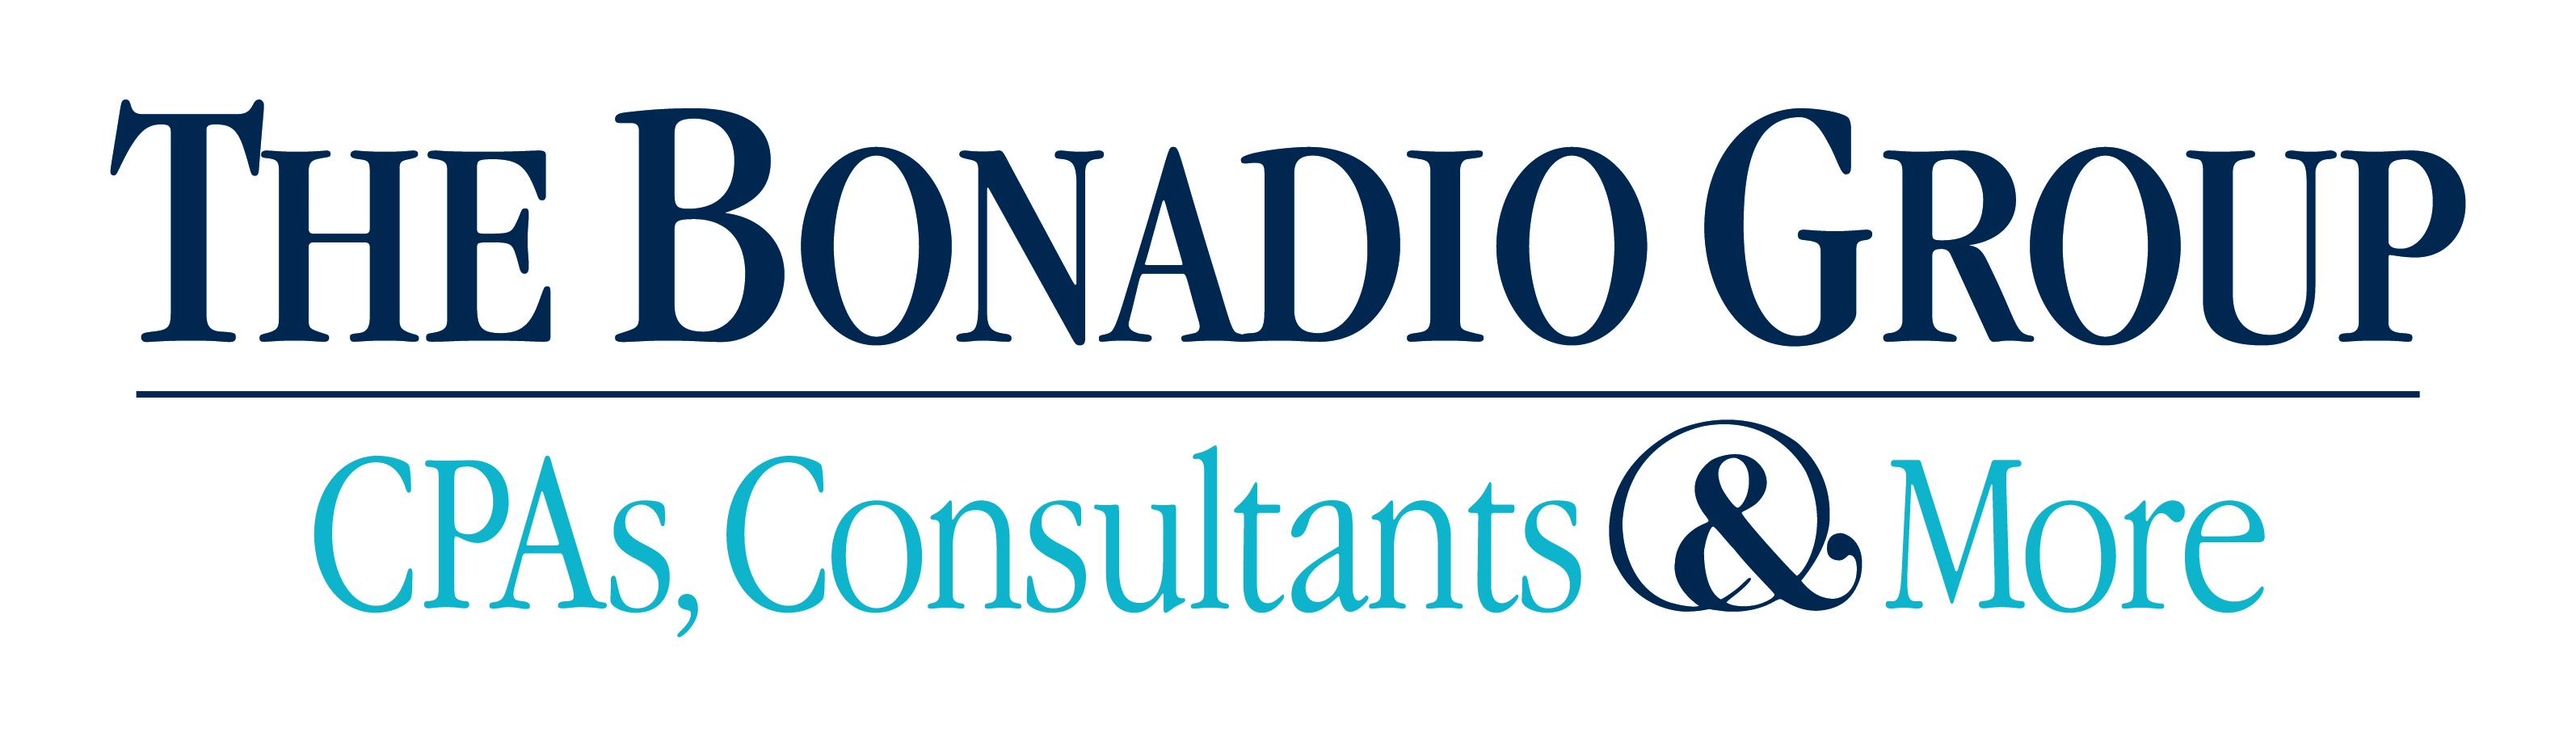 The Bonadio Group